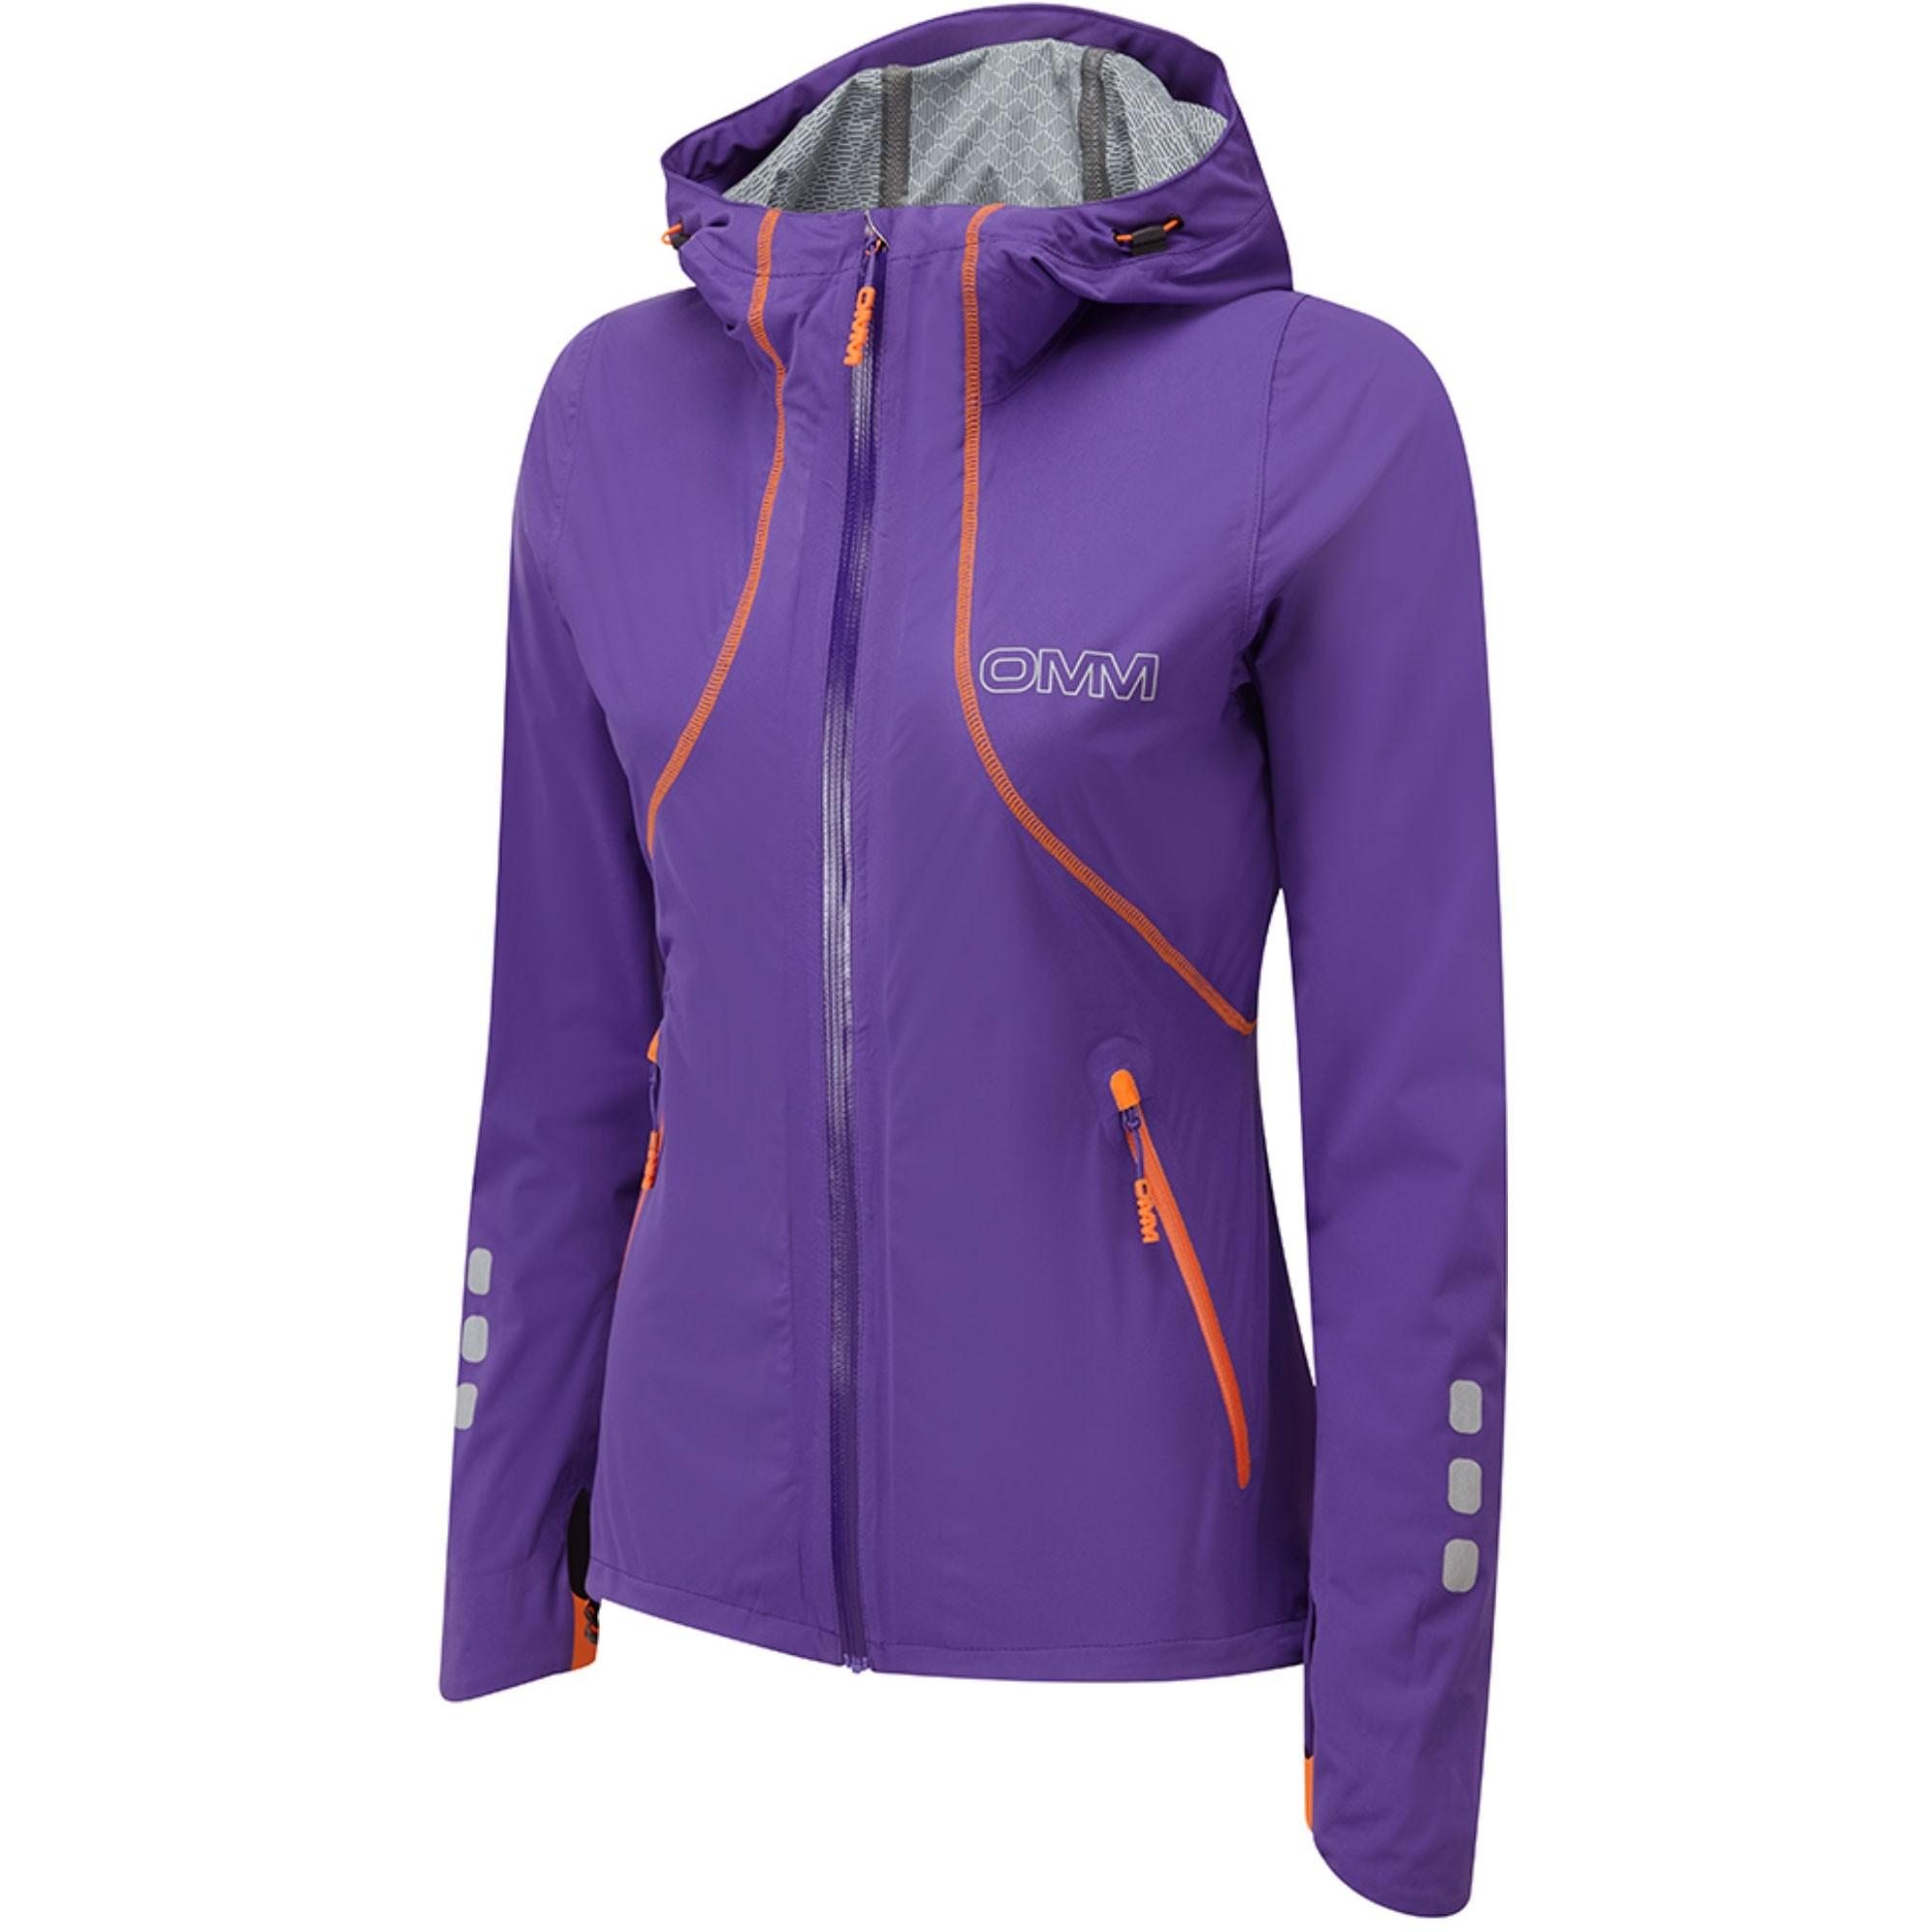 OMM Kamleika Women's Waterproof Running Jacket - Purple